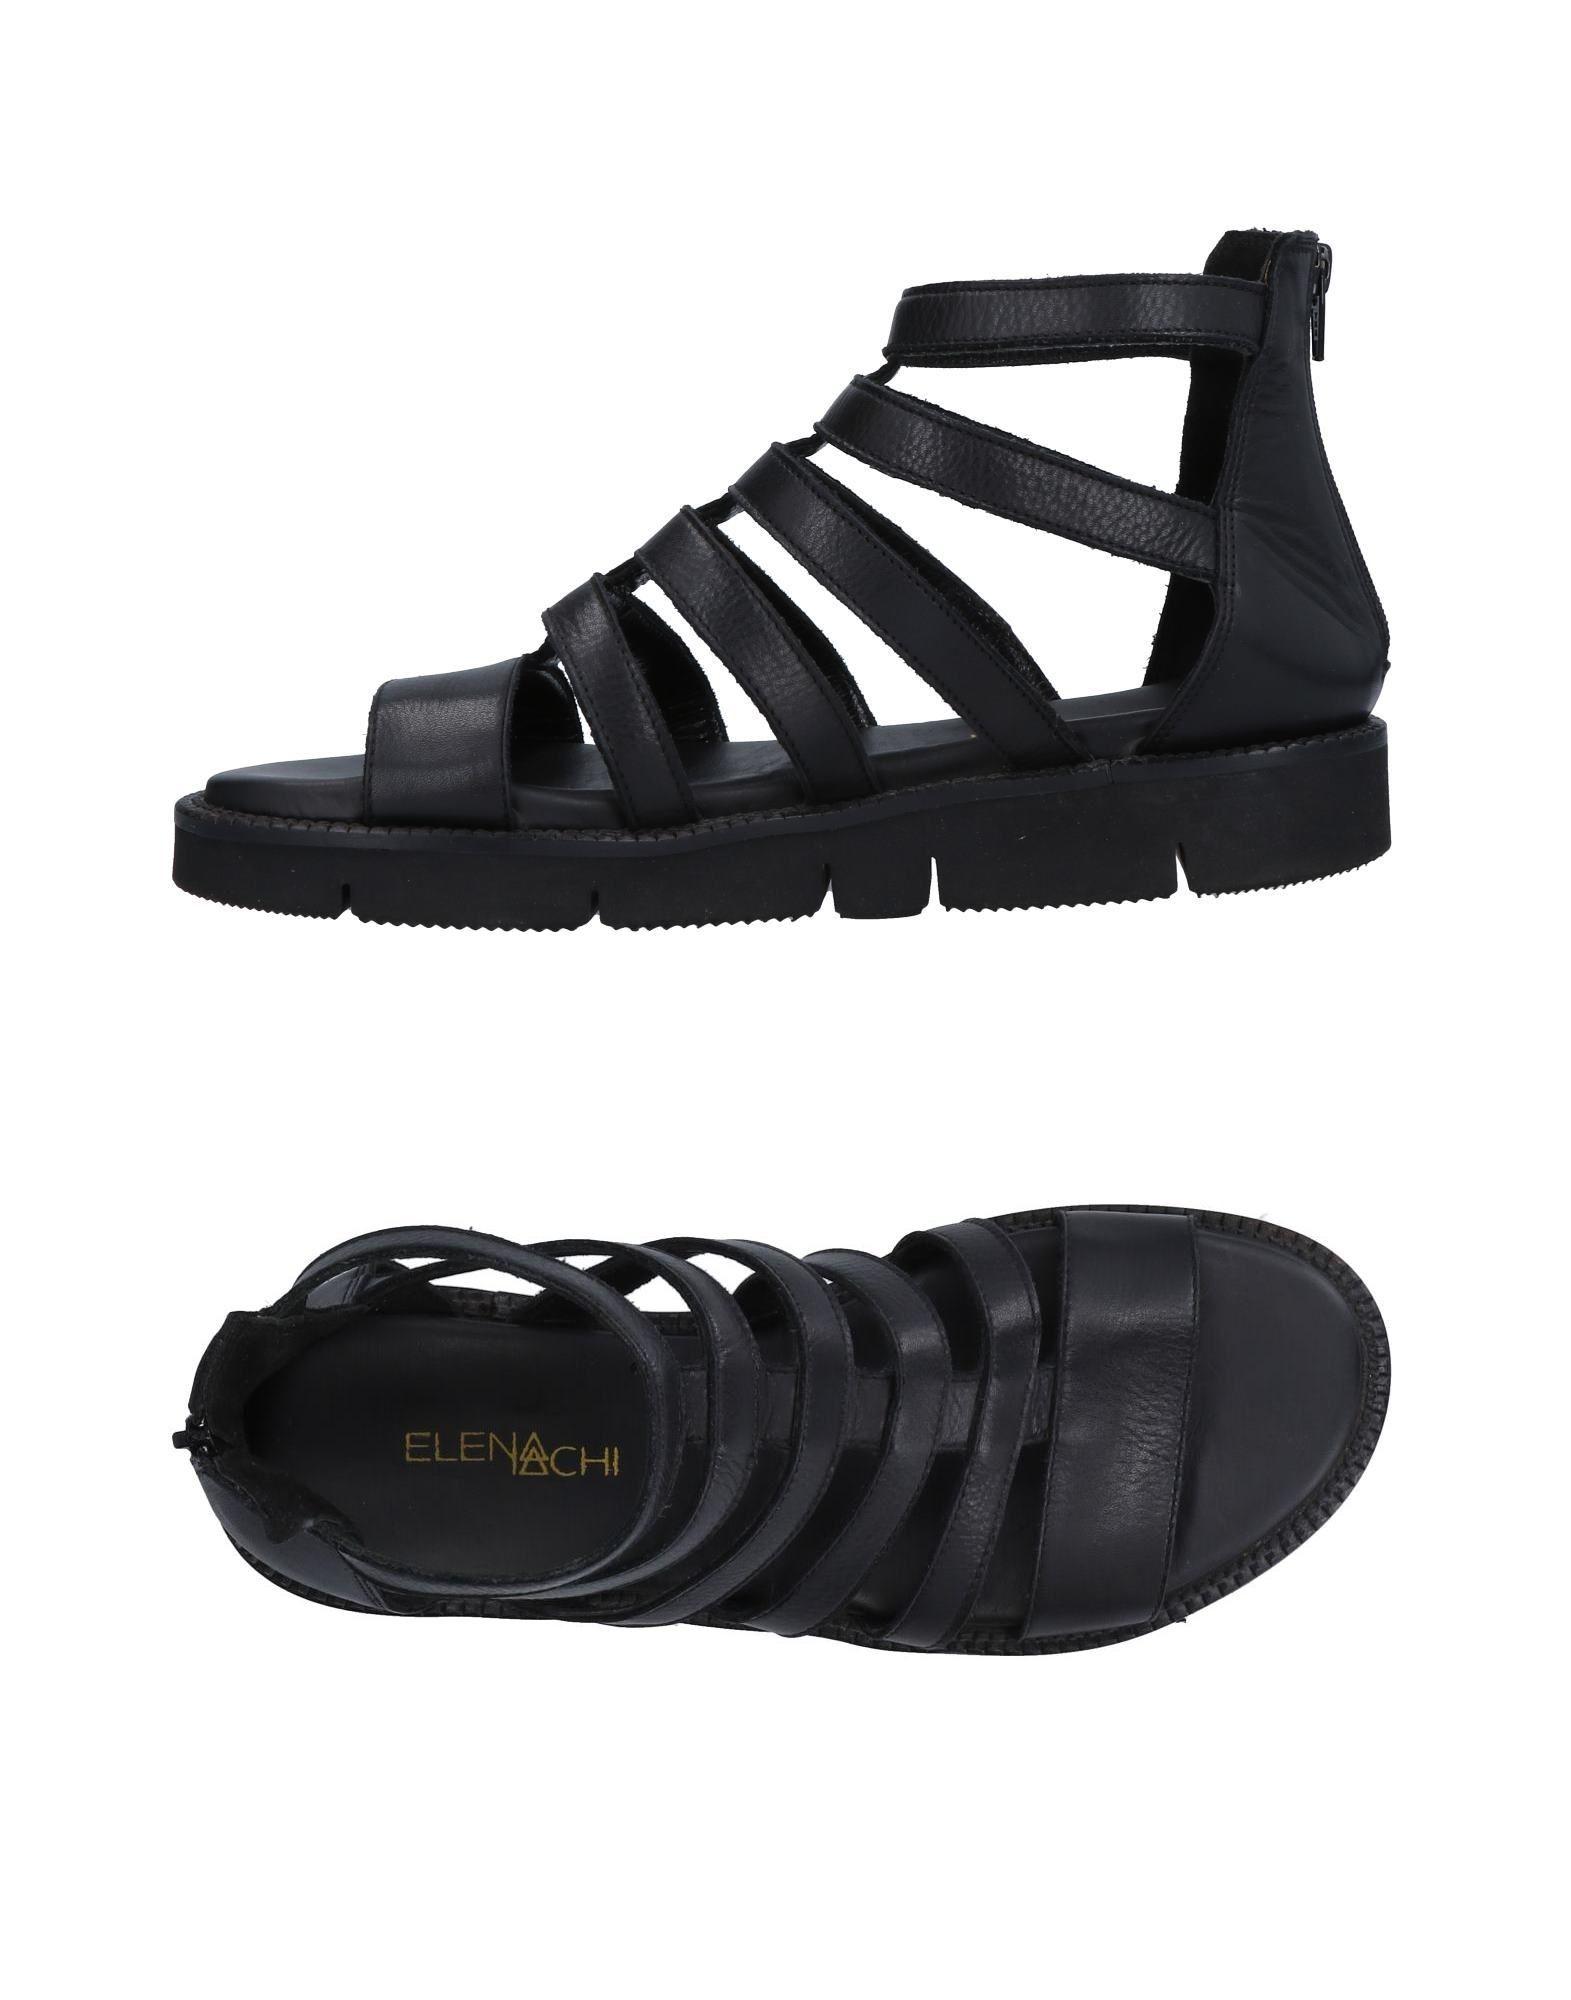 Stilvolle billige Schuhe Elena Iachi Sandalen Damen  11196812QX 11196812QX 11196812QX 409236